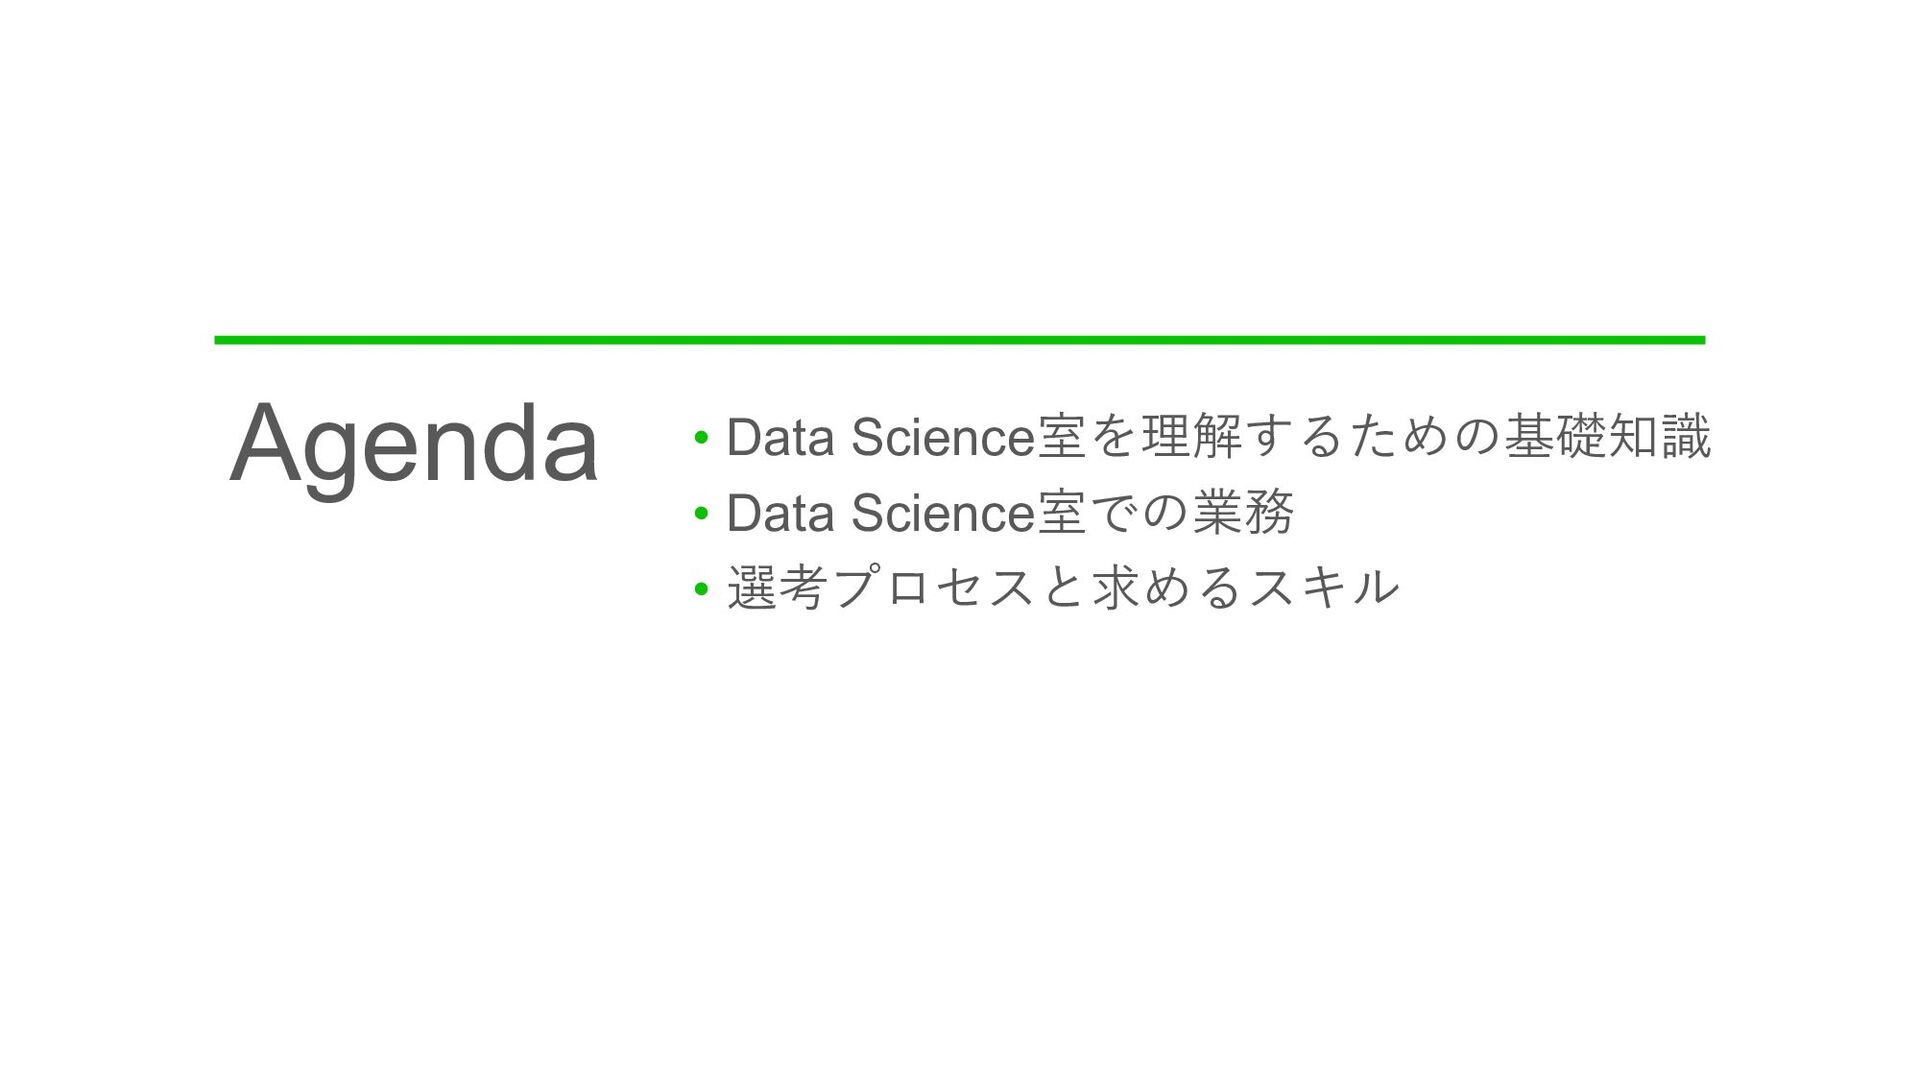 Agenda • Data Science室を理解するための基礎知識 • Data Scien...